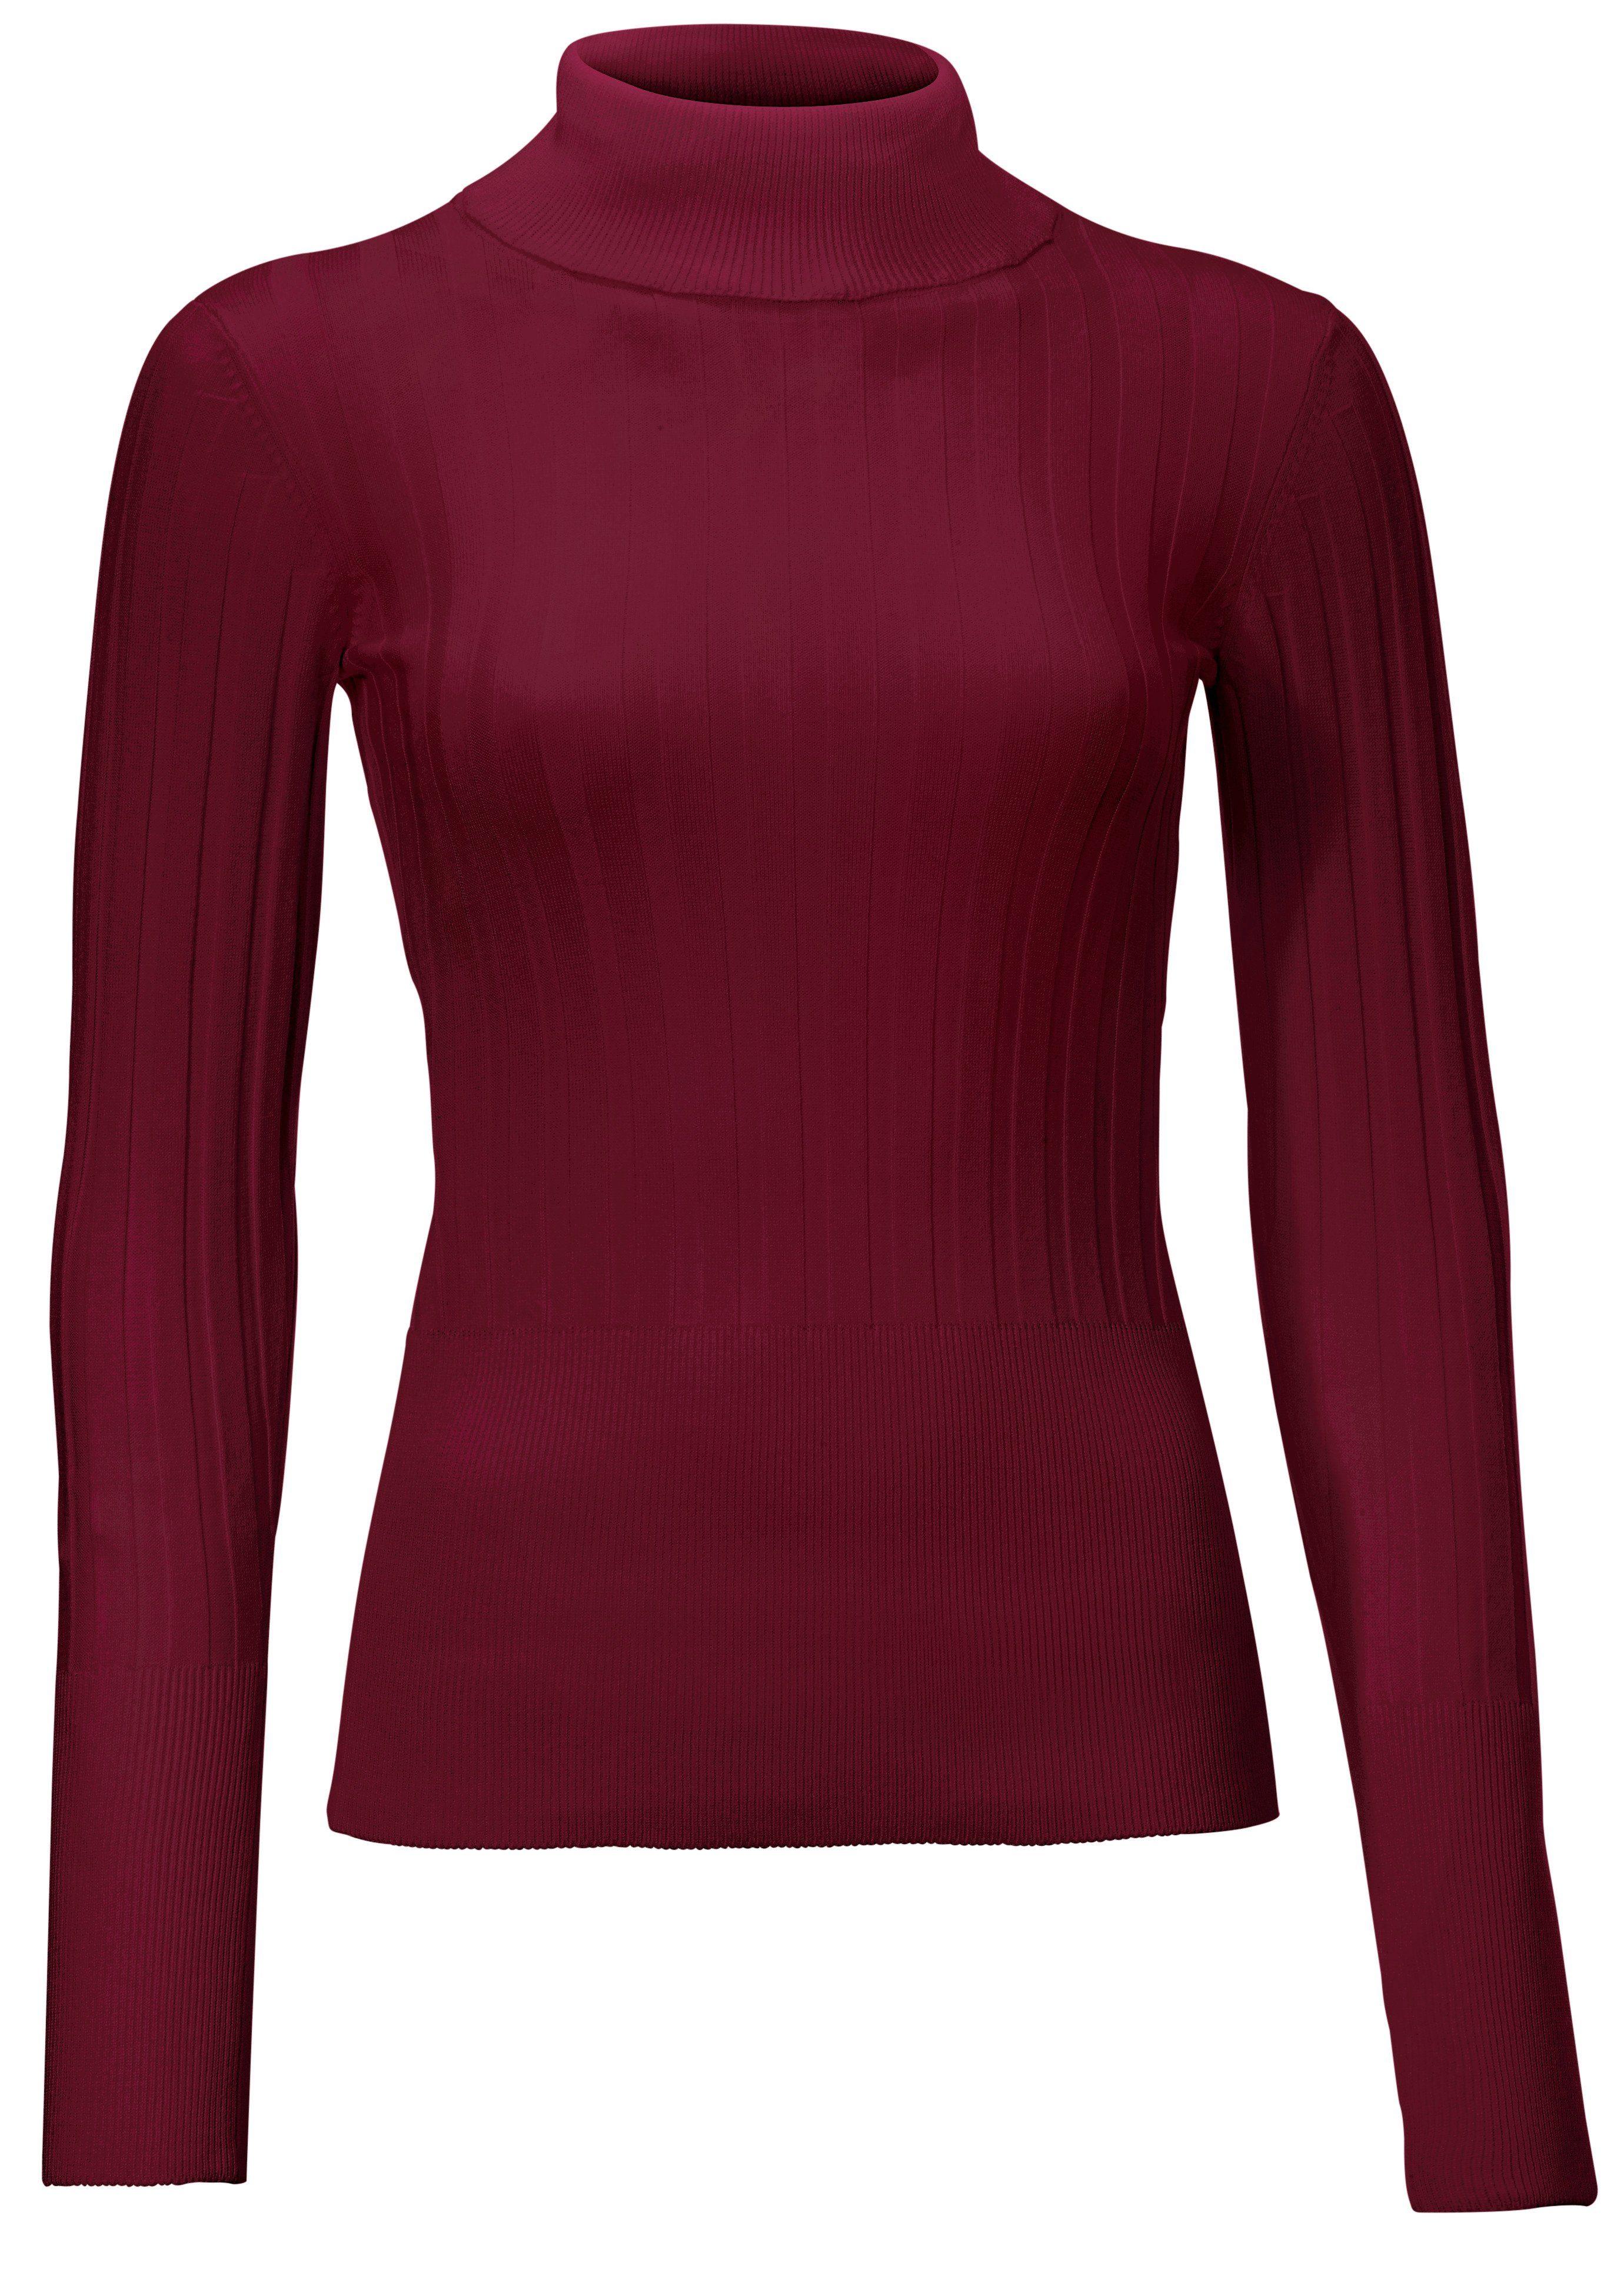 ... Pullover met V-hals, Fijngebreide pullover, Only gestreepte trui »AYA«,  Vero Moda trui met V-hals »LEX SUN«